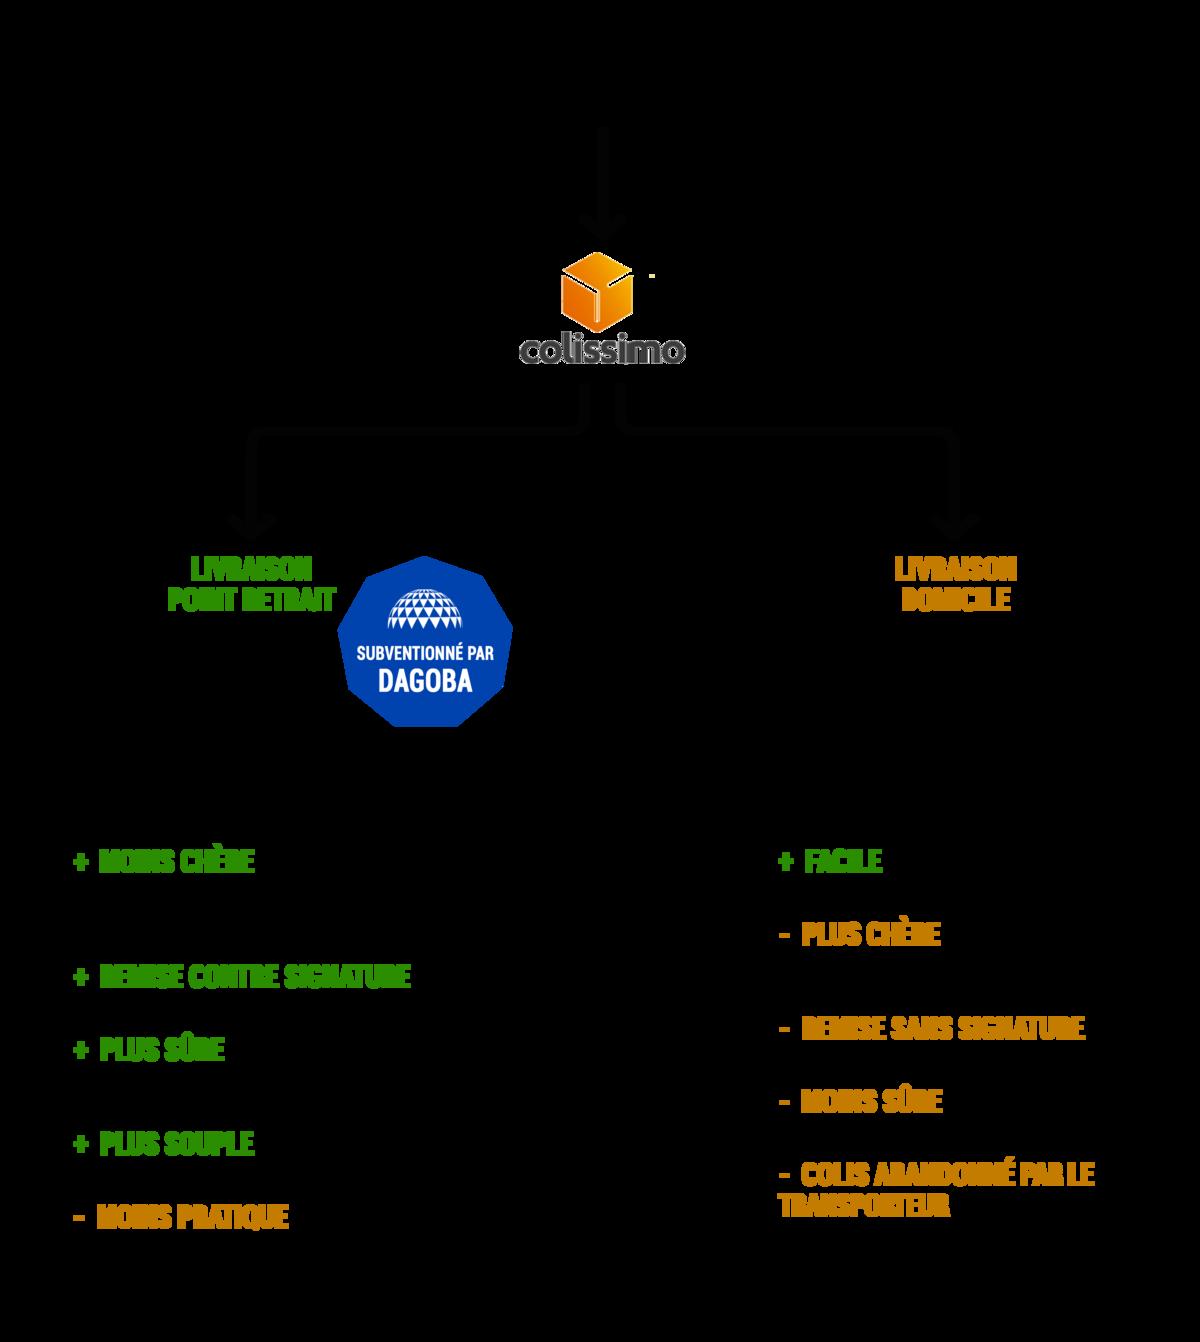 Image_schema-modes-livraison-eu--0-0--bd2910d1-aea9-471e-b49b-d6f3ec835c23